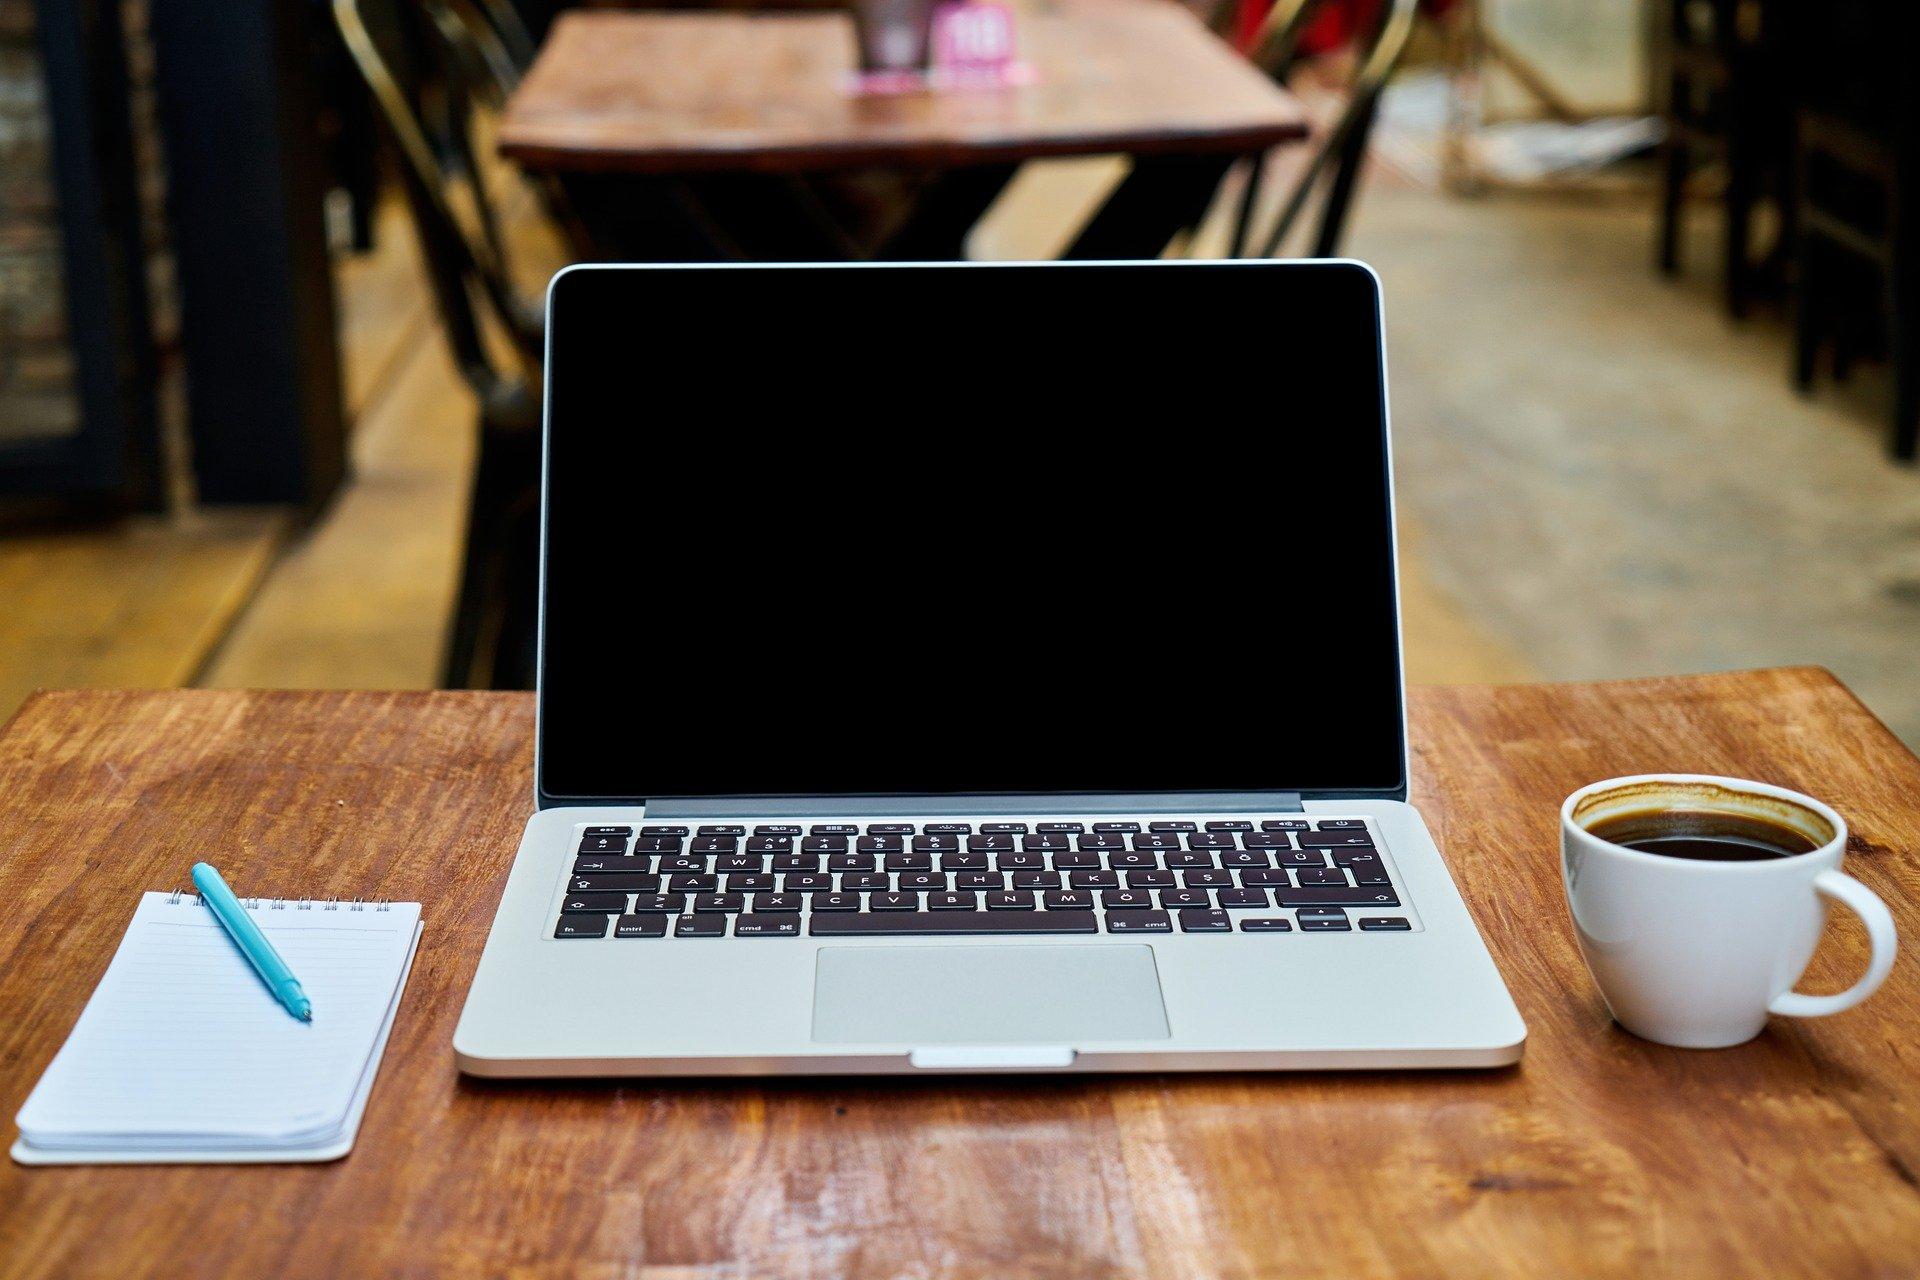 lap top, computer, kaffe, cafe, arbejde